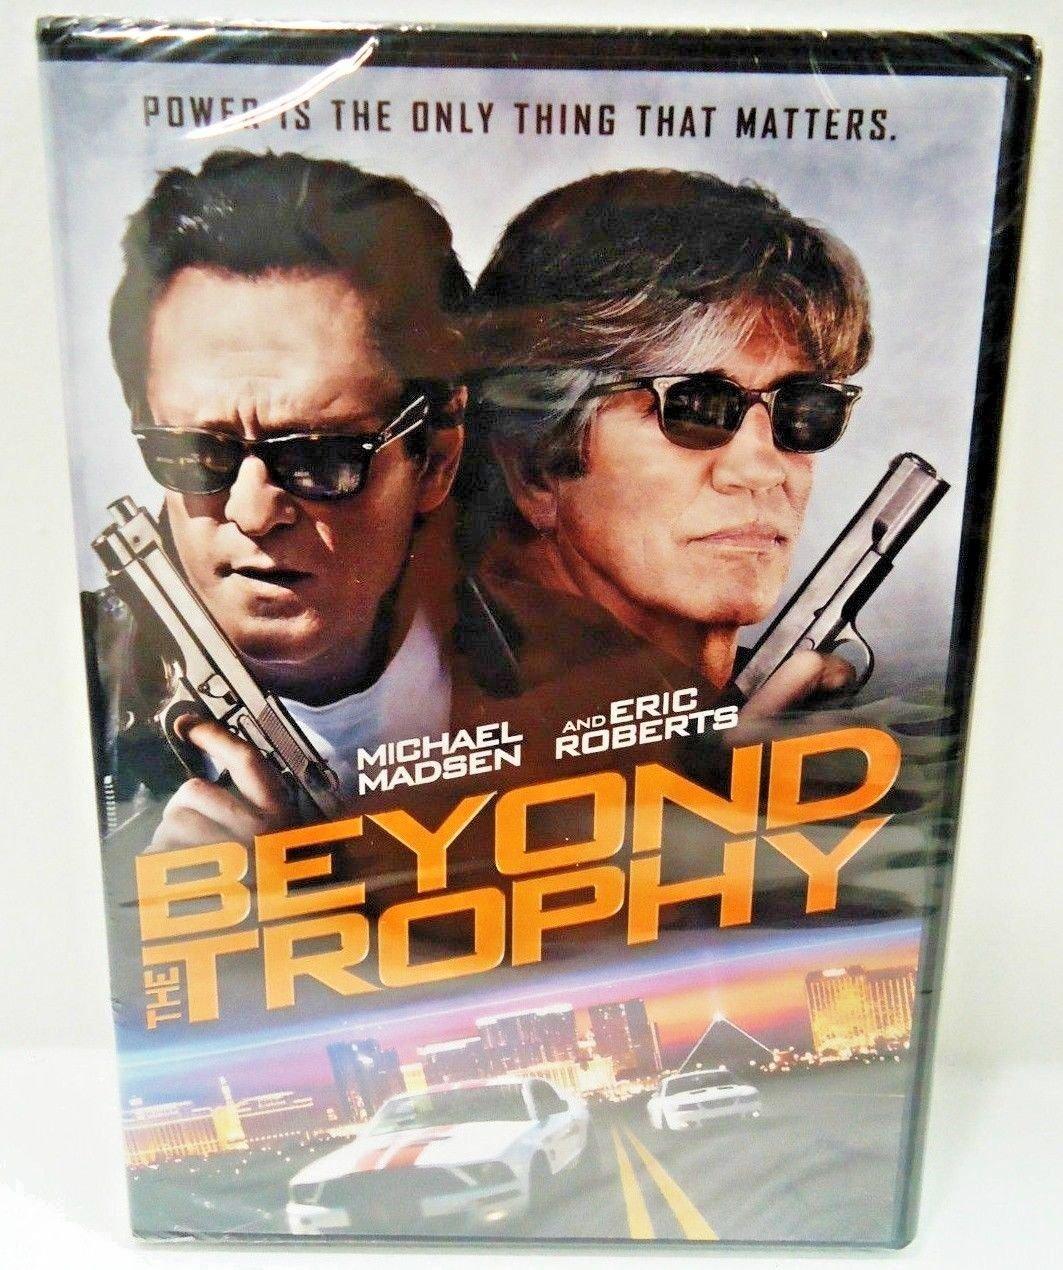 BEYOND THE TROPHY - DVD - MICHAEL MADSEN - BRAND NEW - CRIME - THRILLER - MOVIE